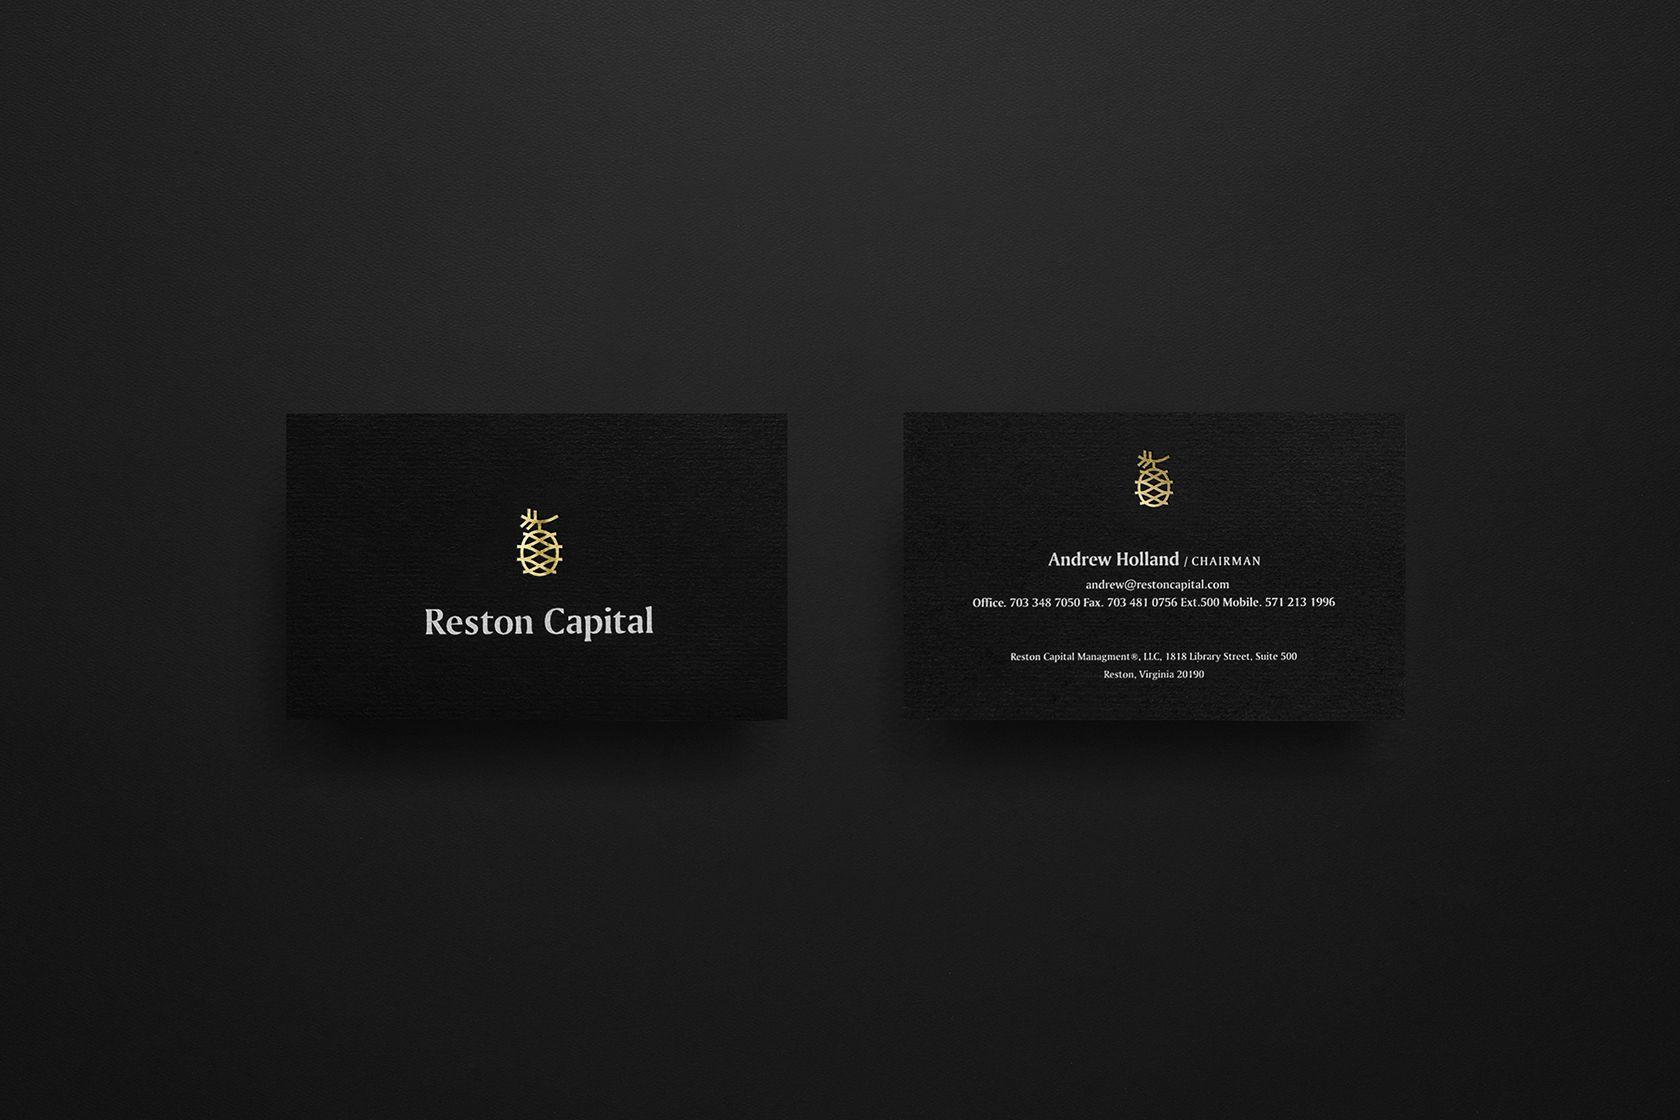 50 business cards volume two design pinterest cards and 50 business cards volume two magicingreecefo Gallery